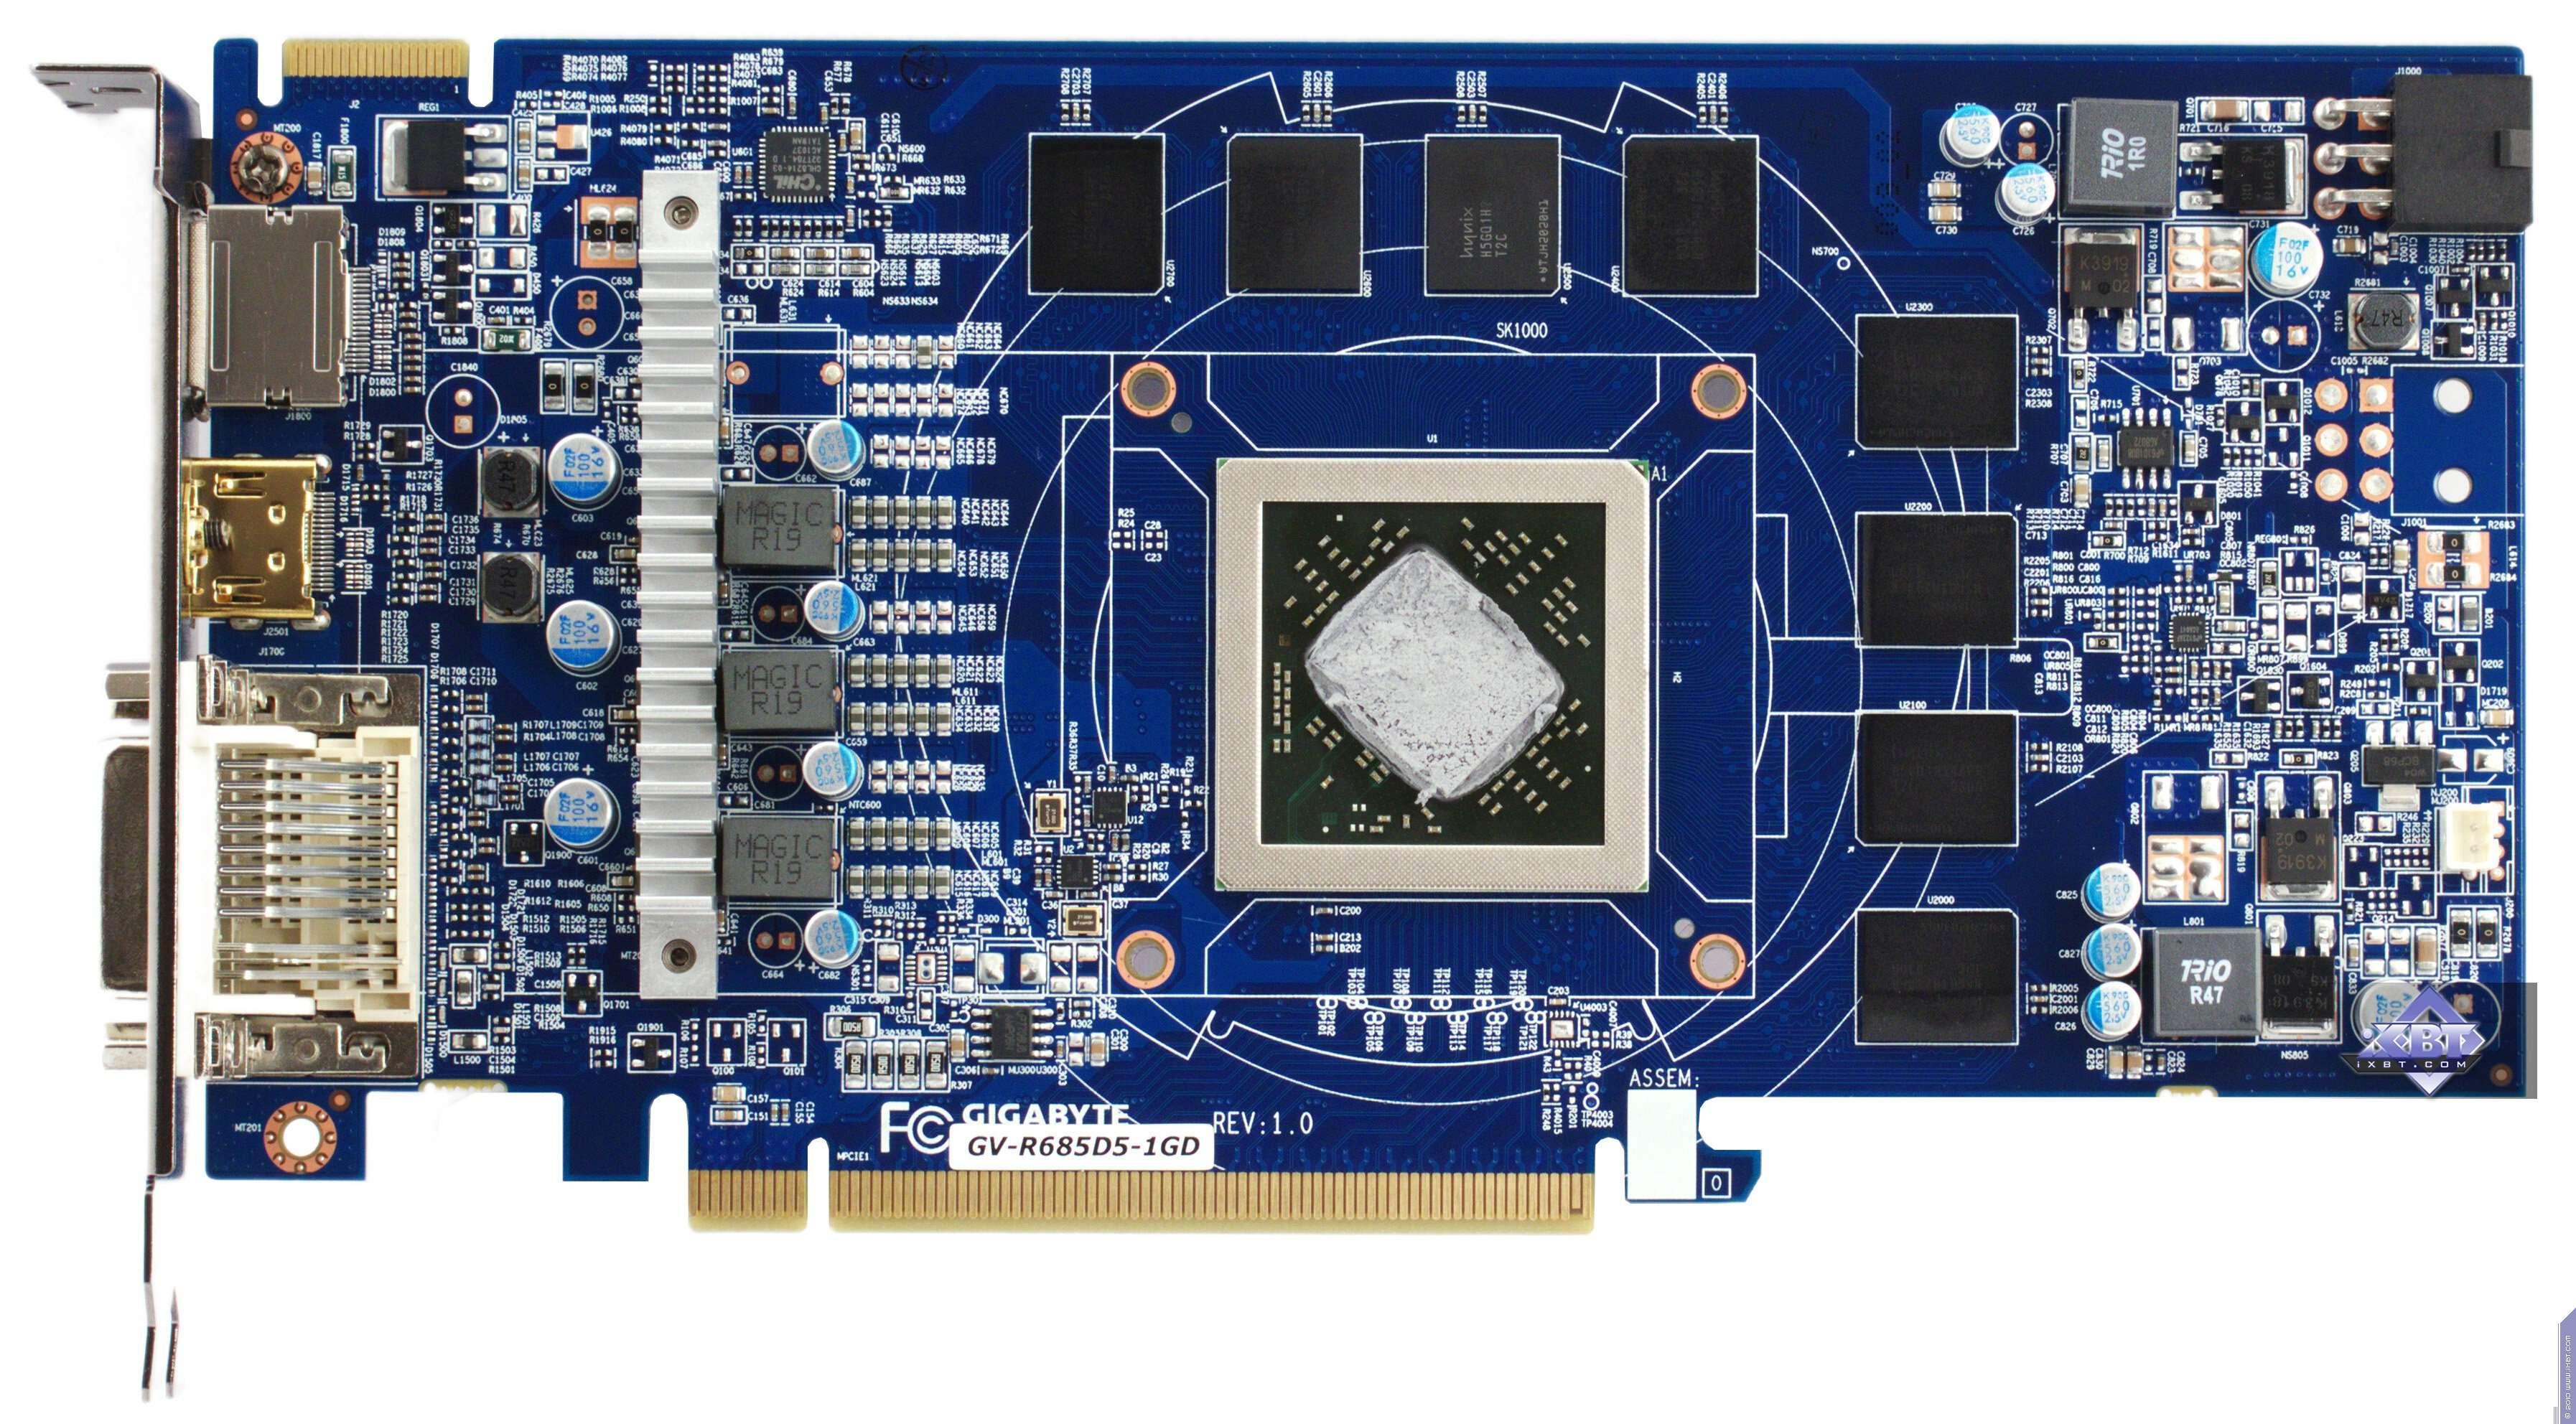 Gigabyte GV-R685D5-1GD Driver for Mac Download